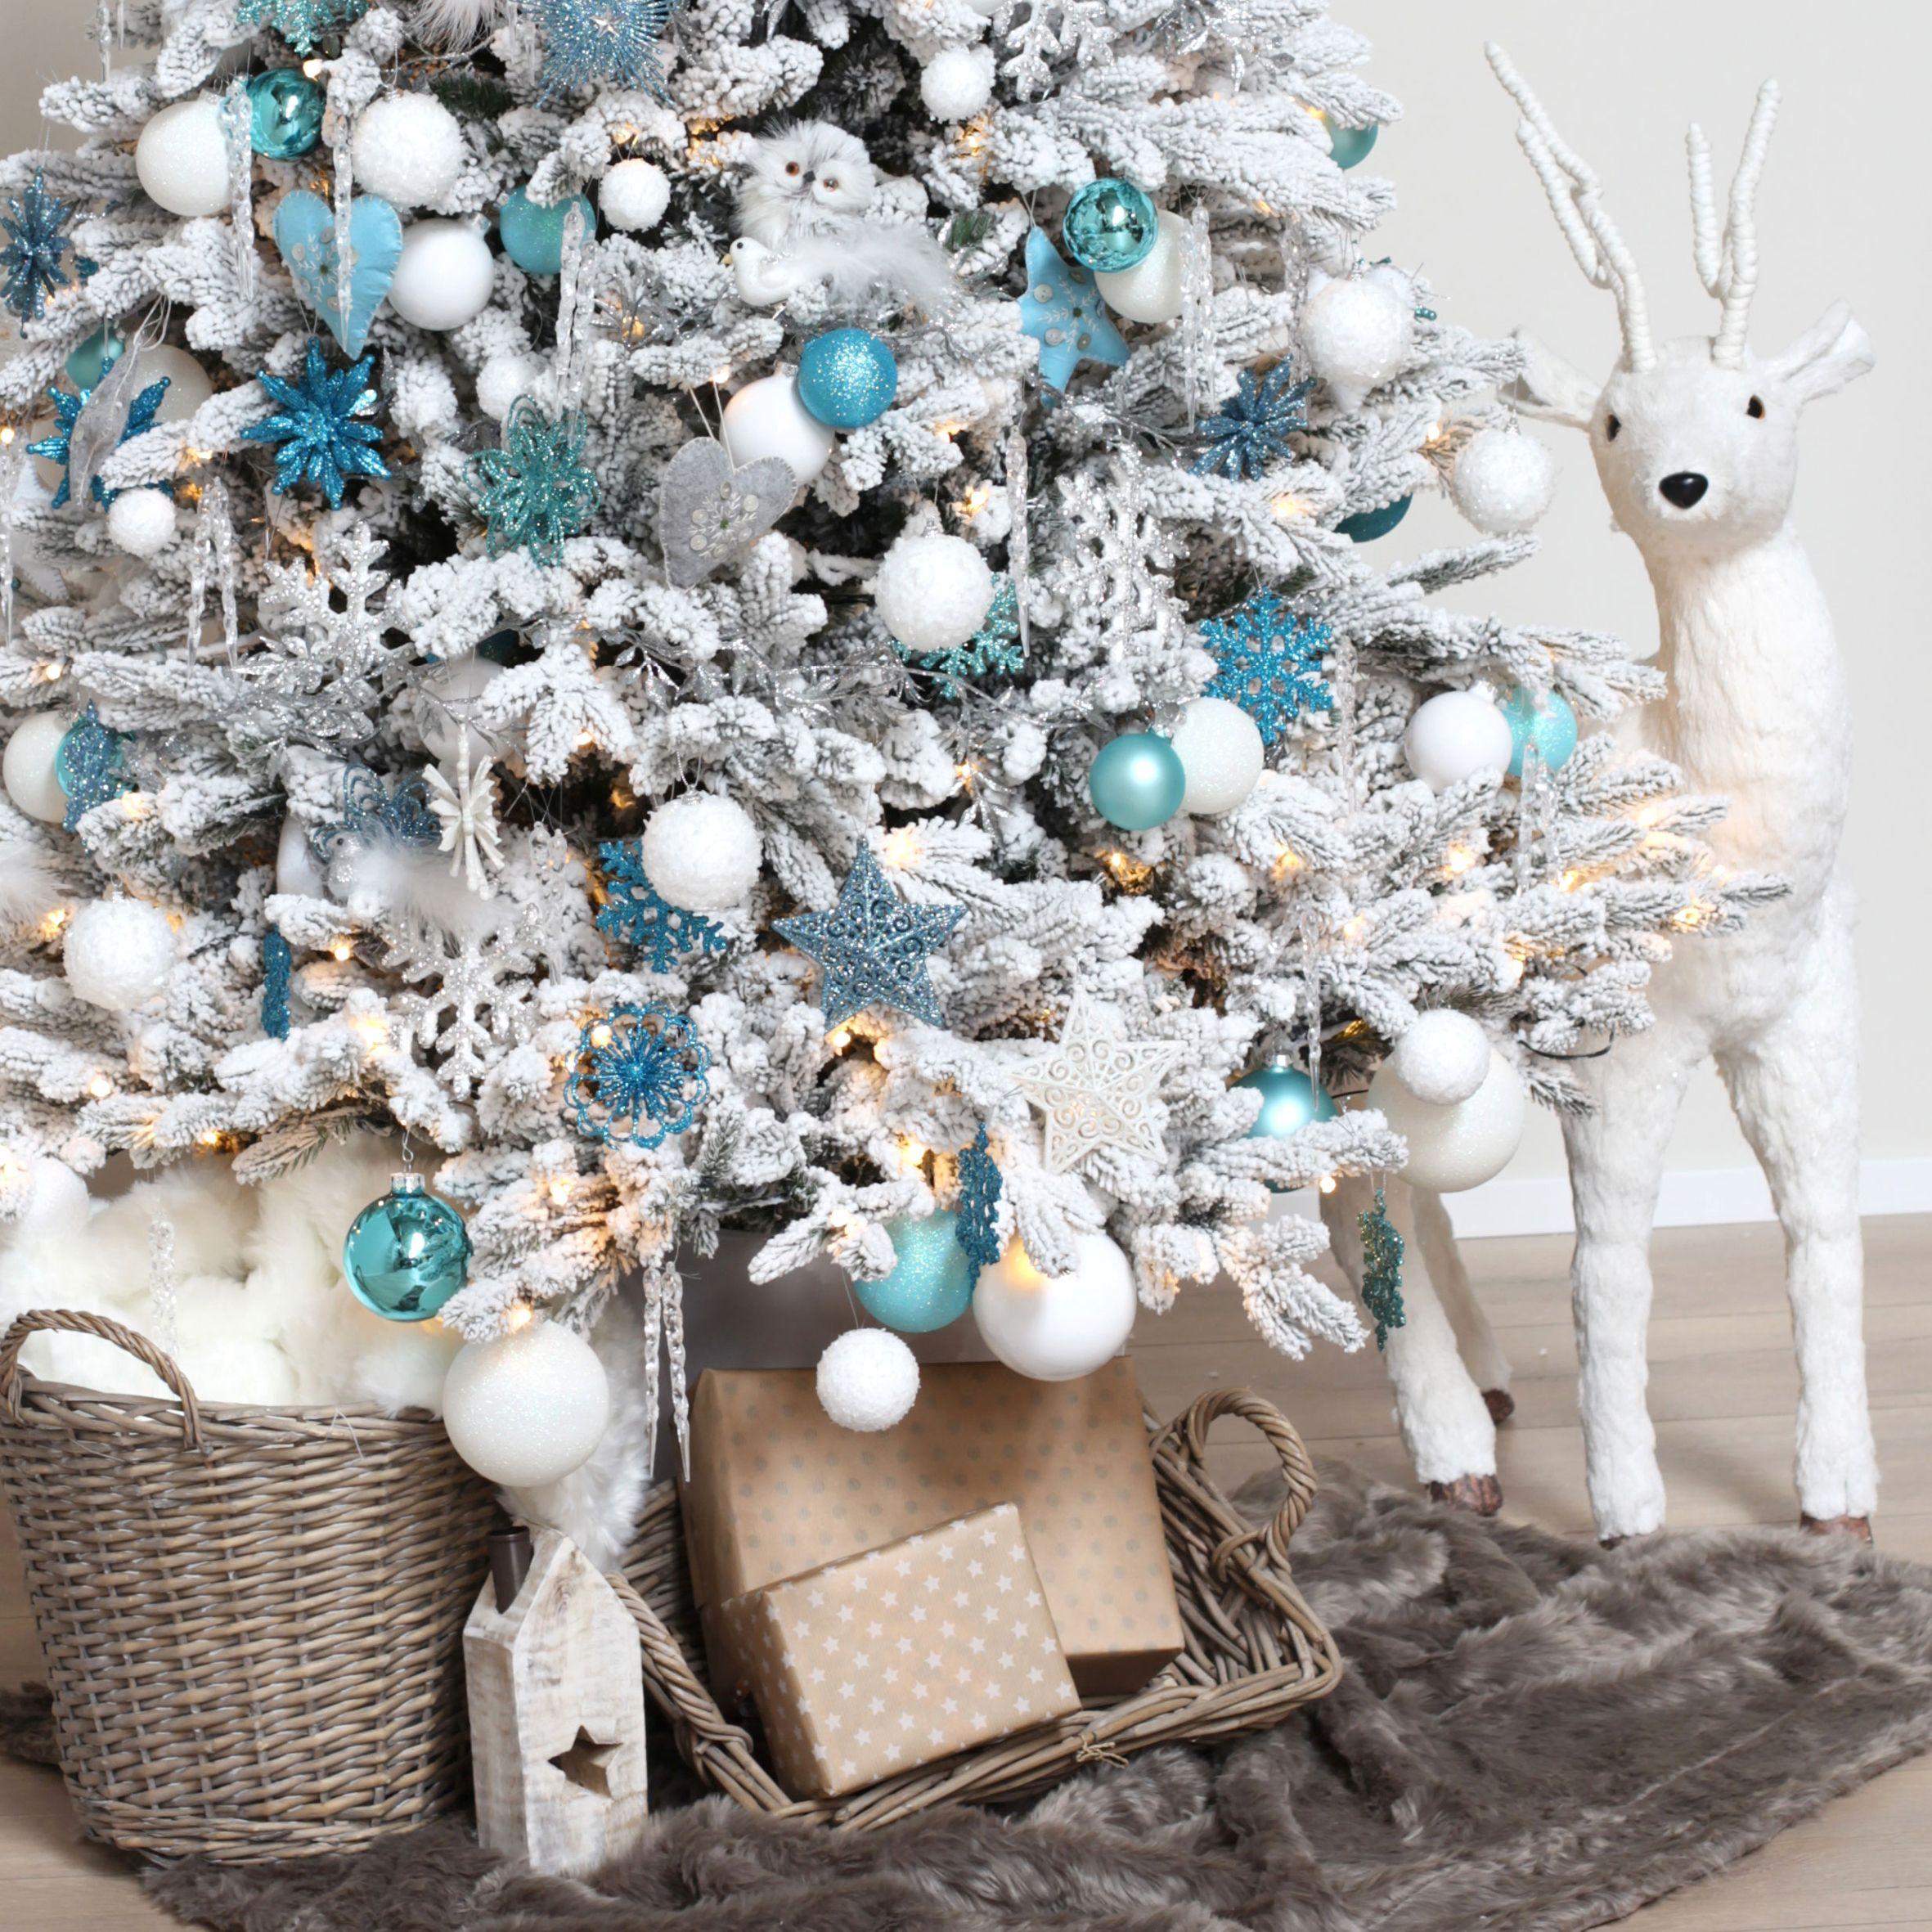 Frozen Christmas Tree Beautiful Christmas Tree Decorated